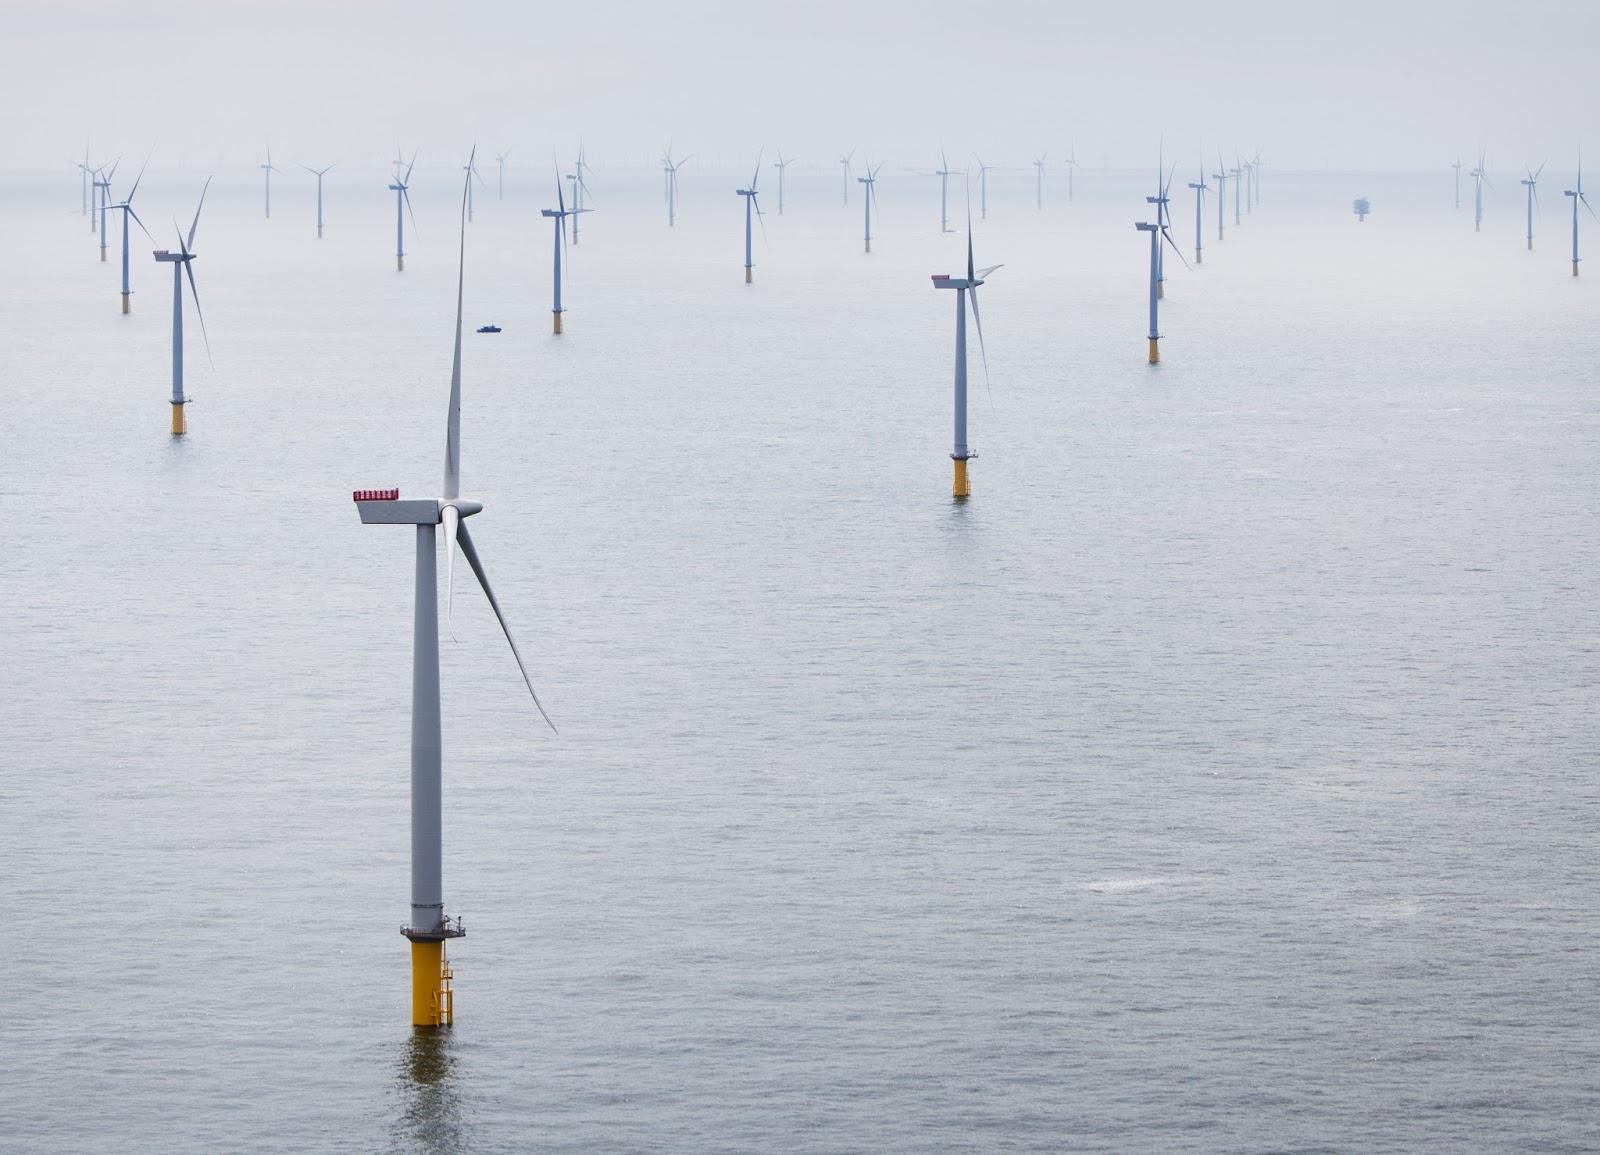 offshore wind farm Siemens wind turbines